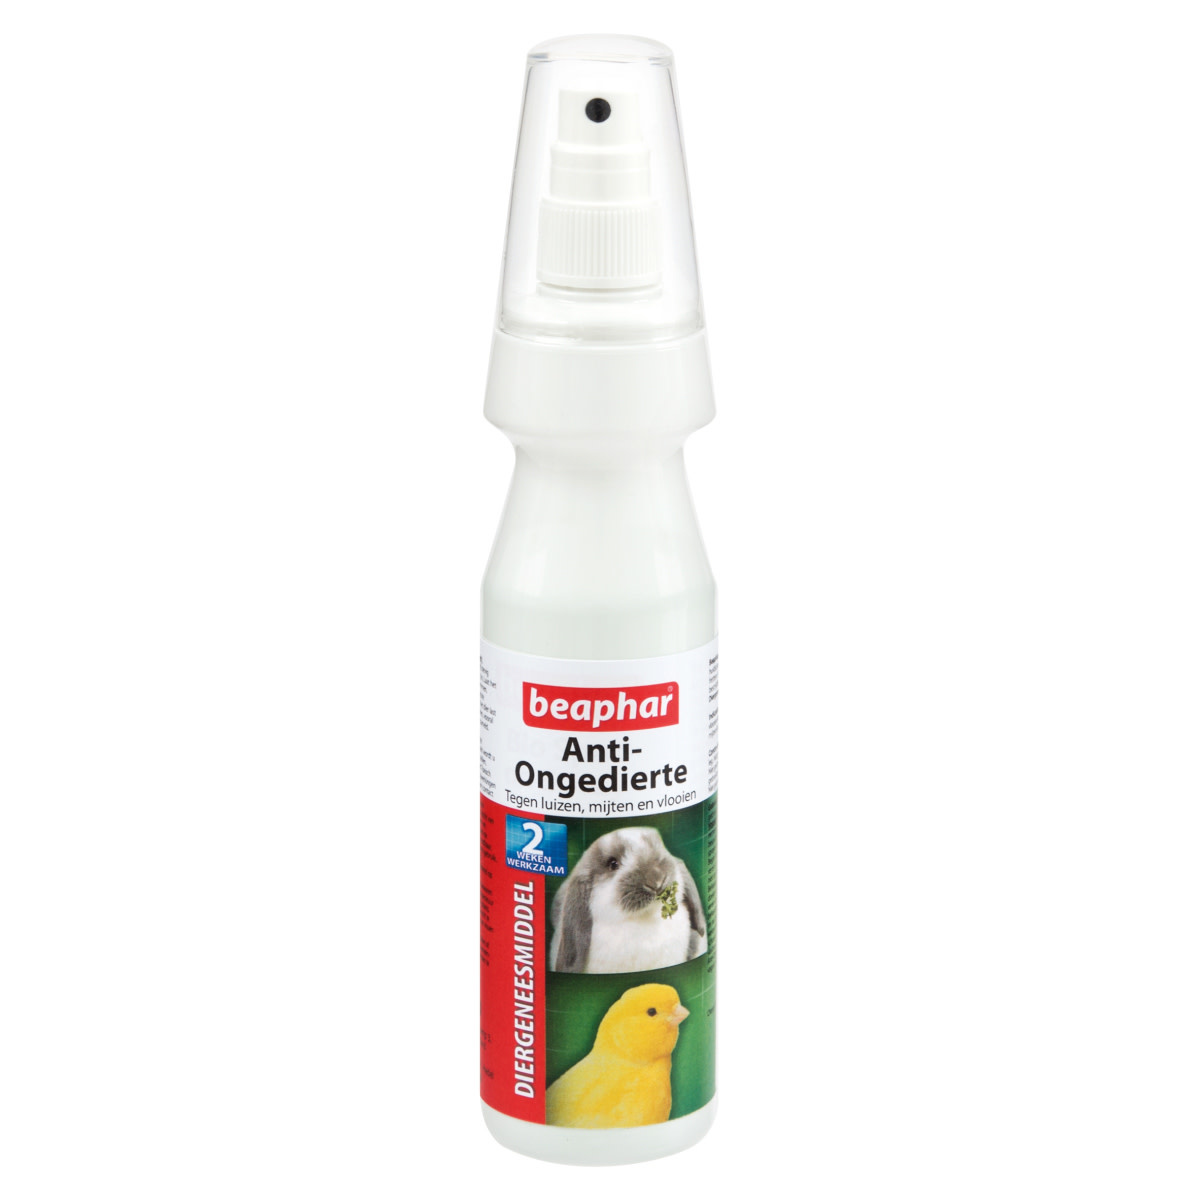 Beau anti-ongedierte spray 150ml